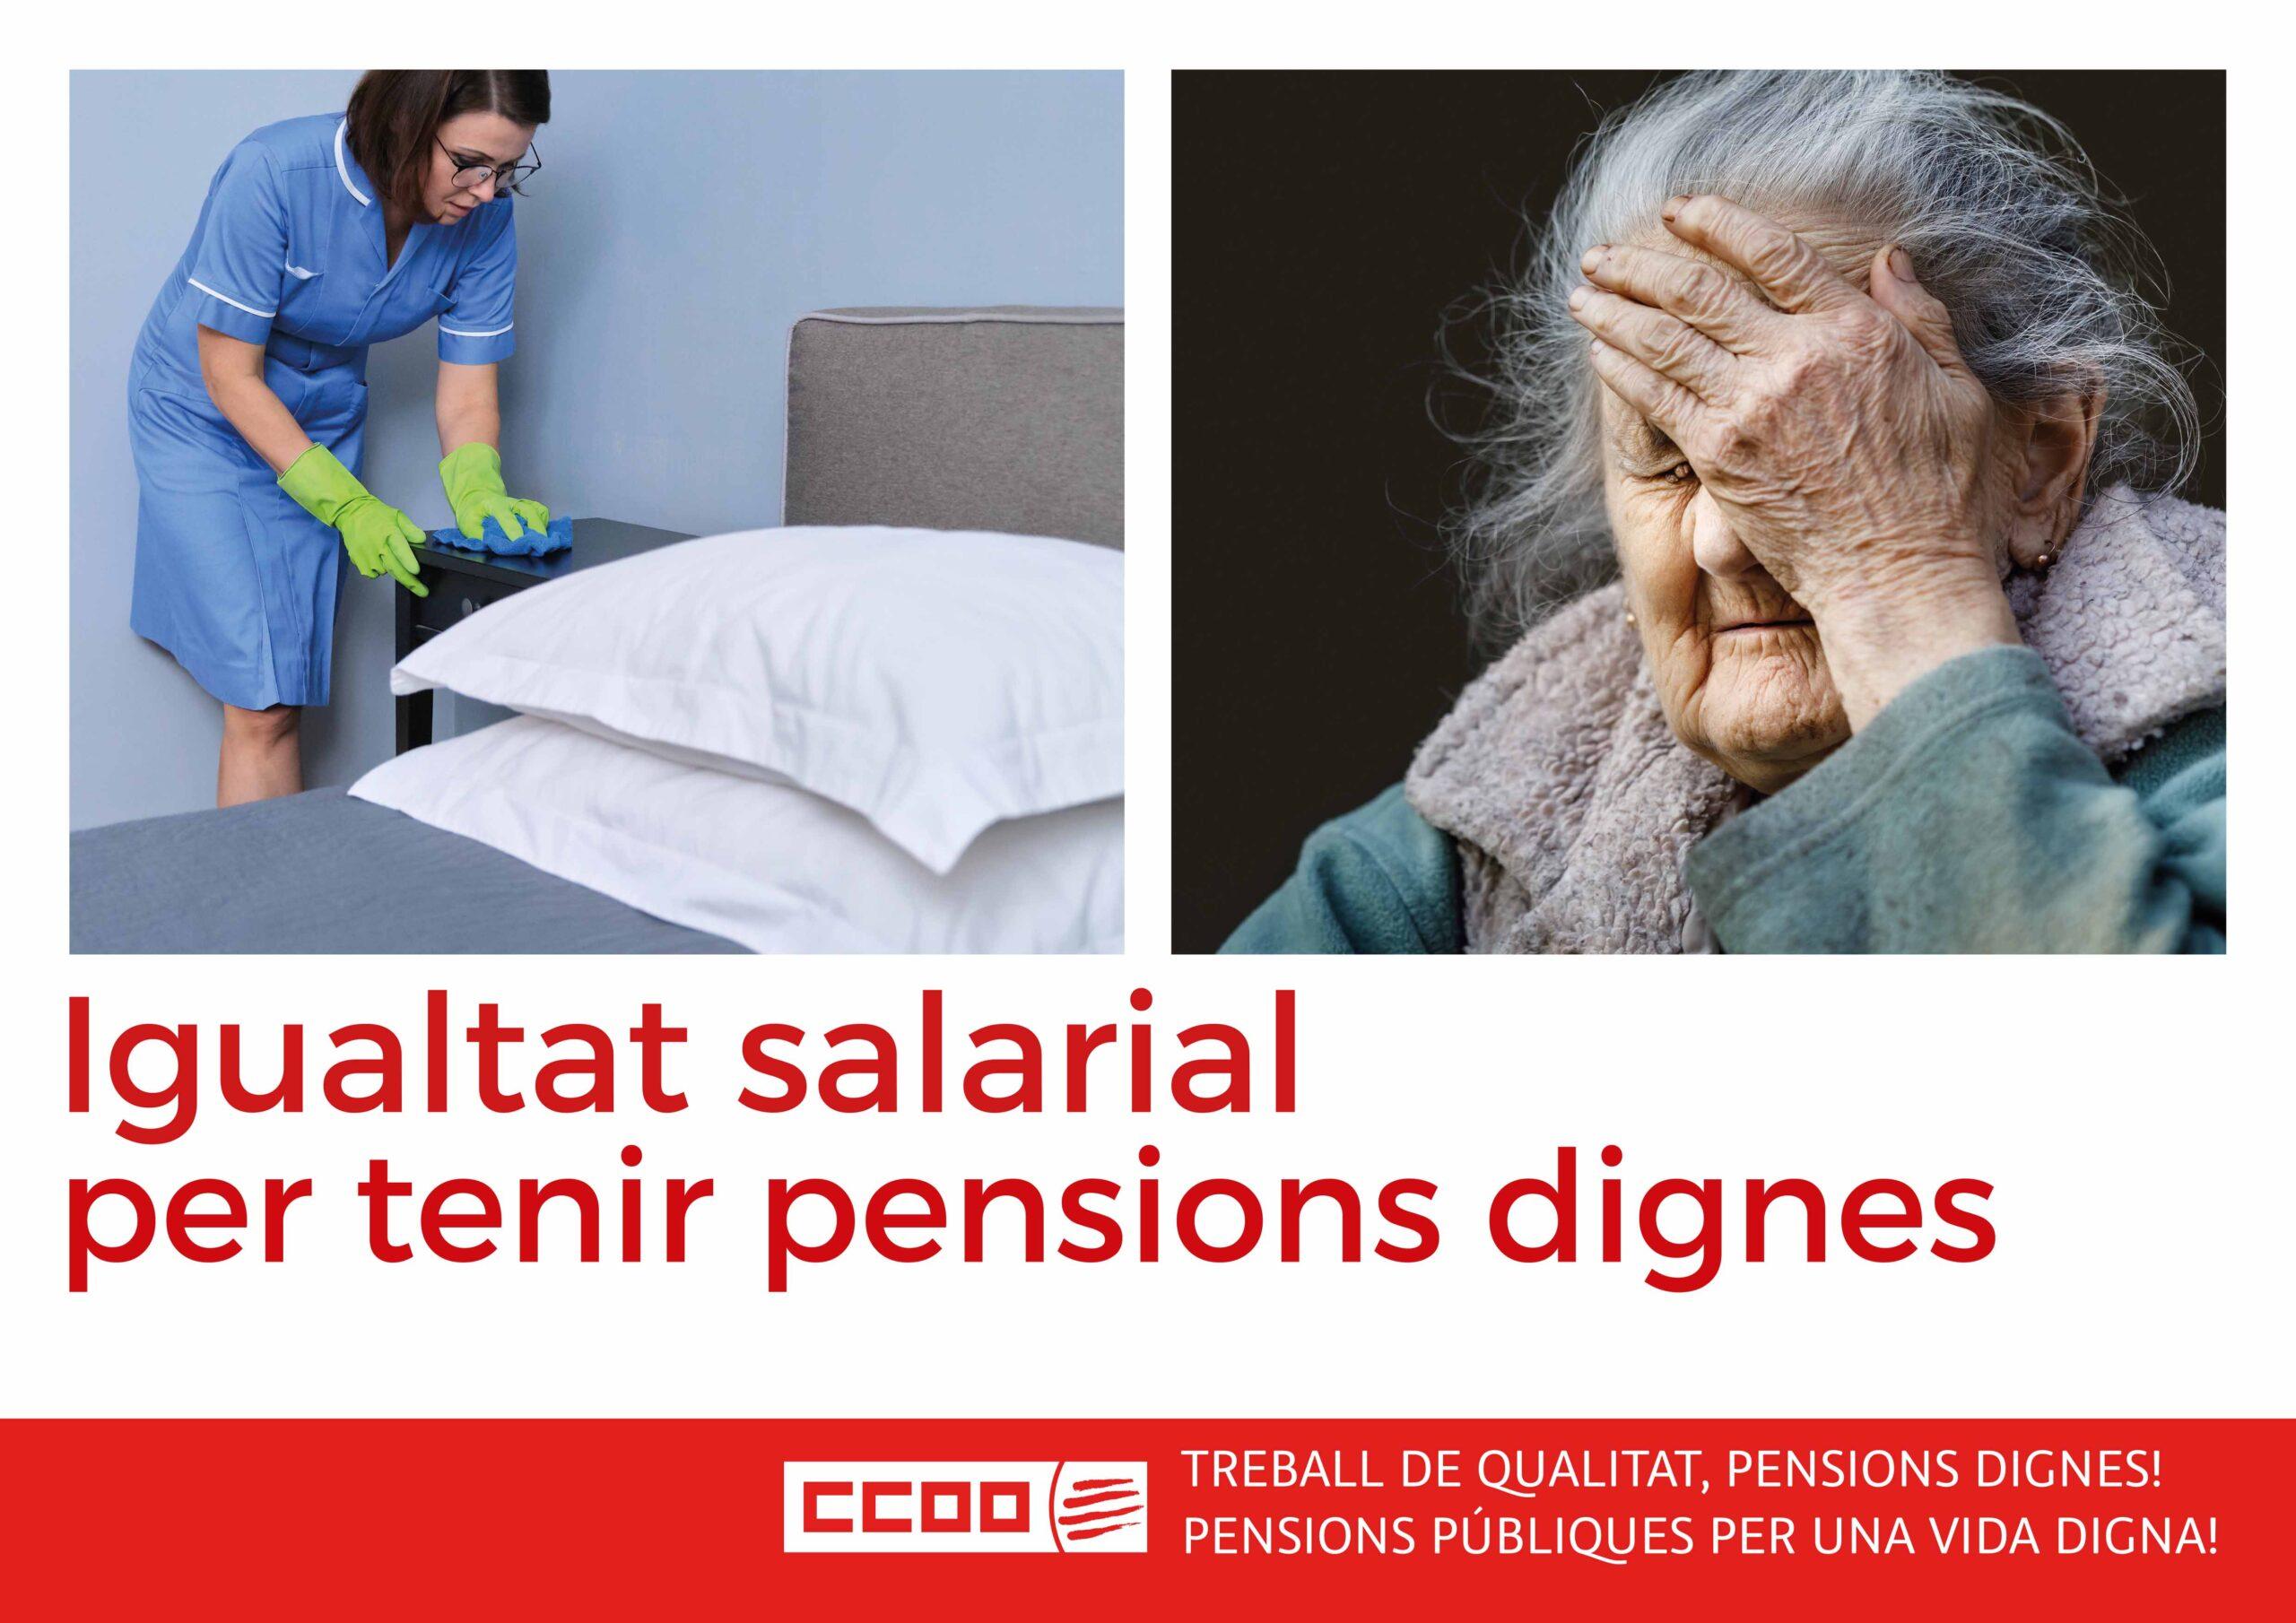 Igualtat salarial per tenir pensions dignes